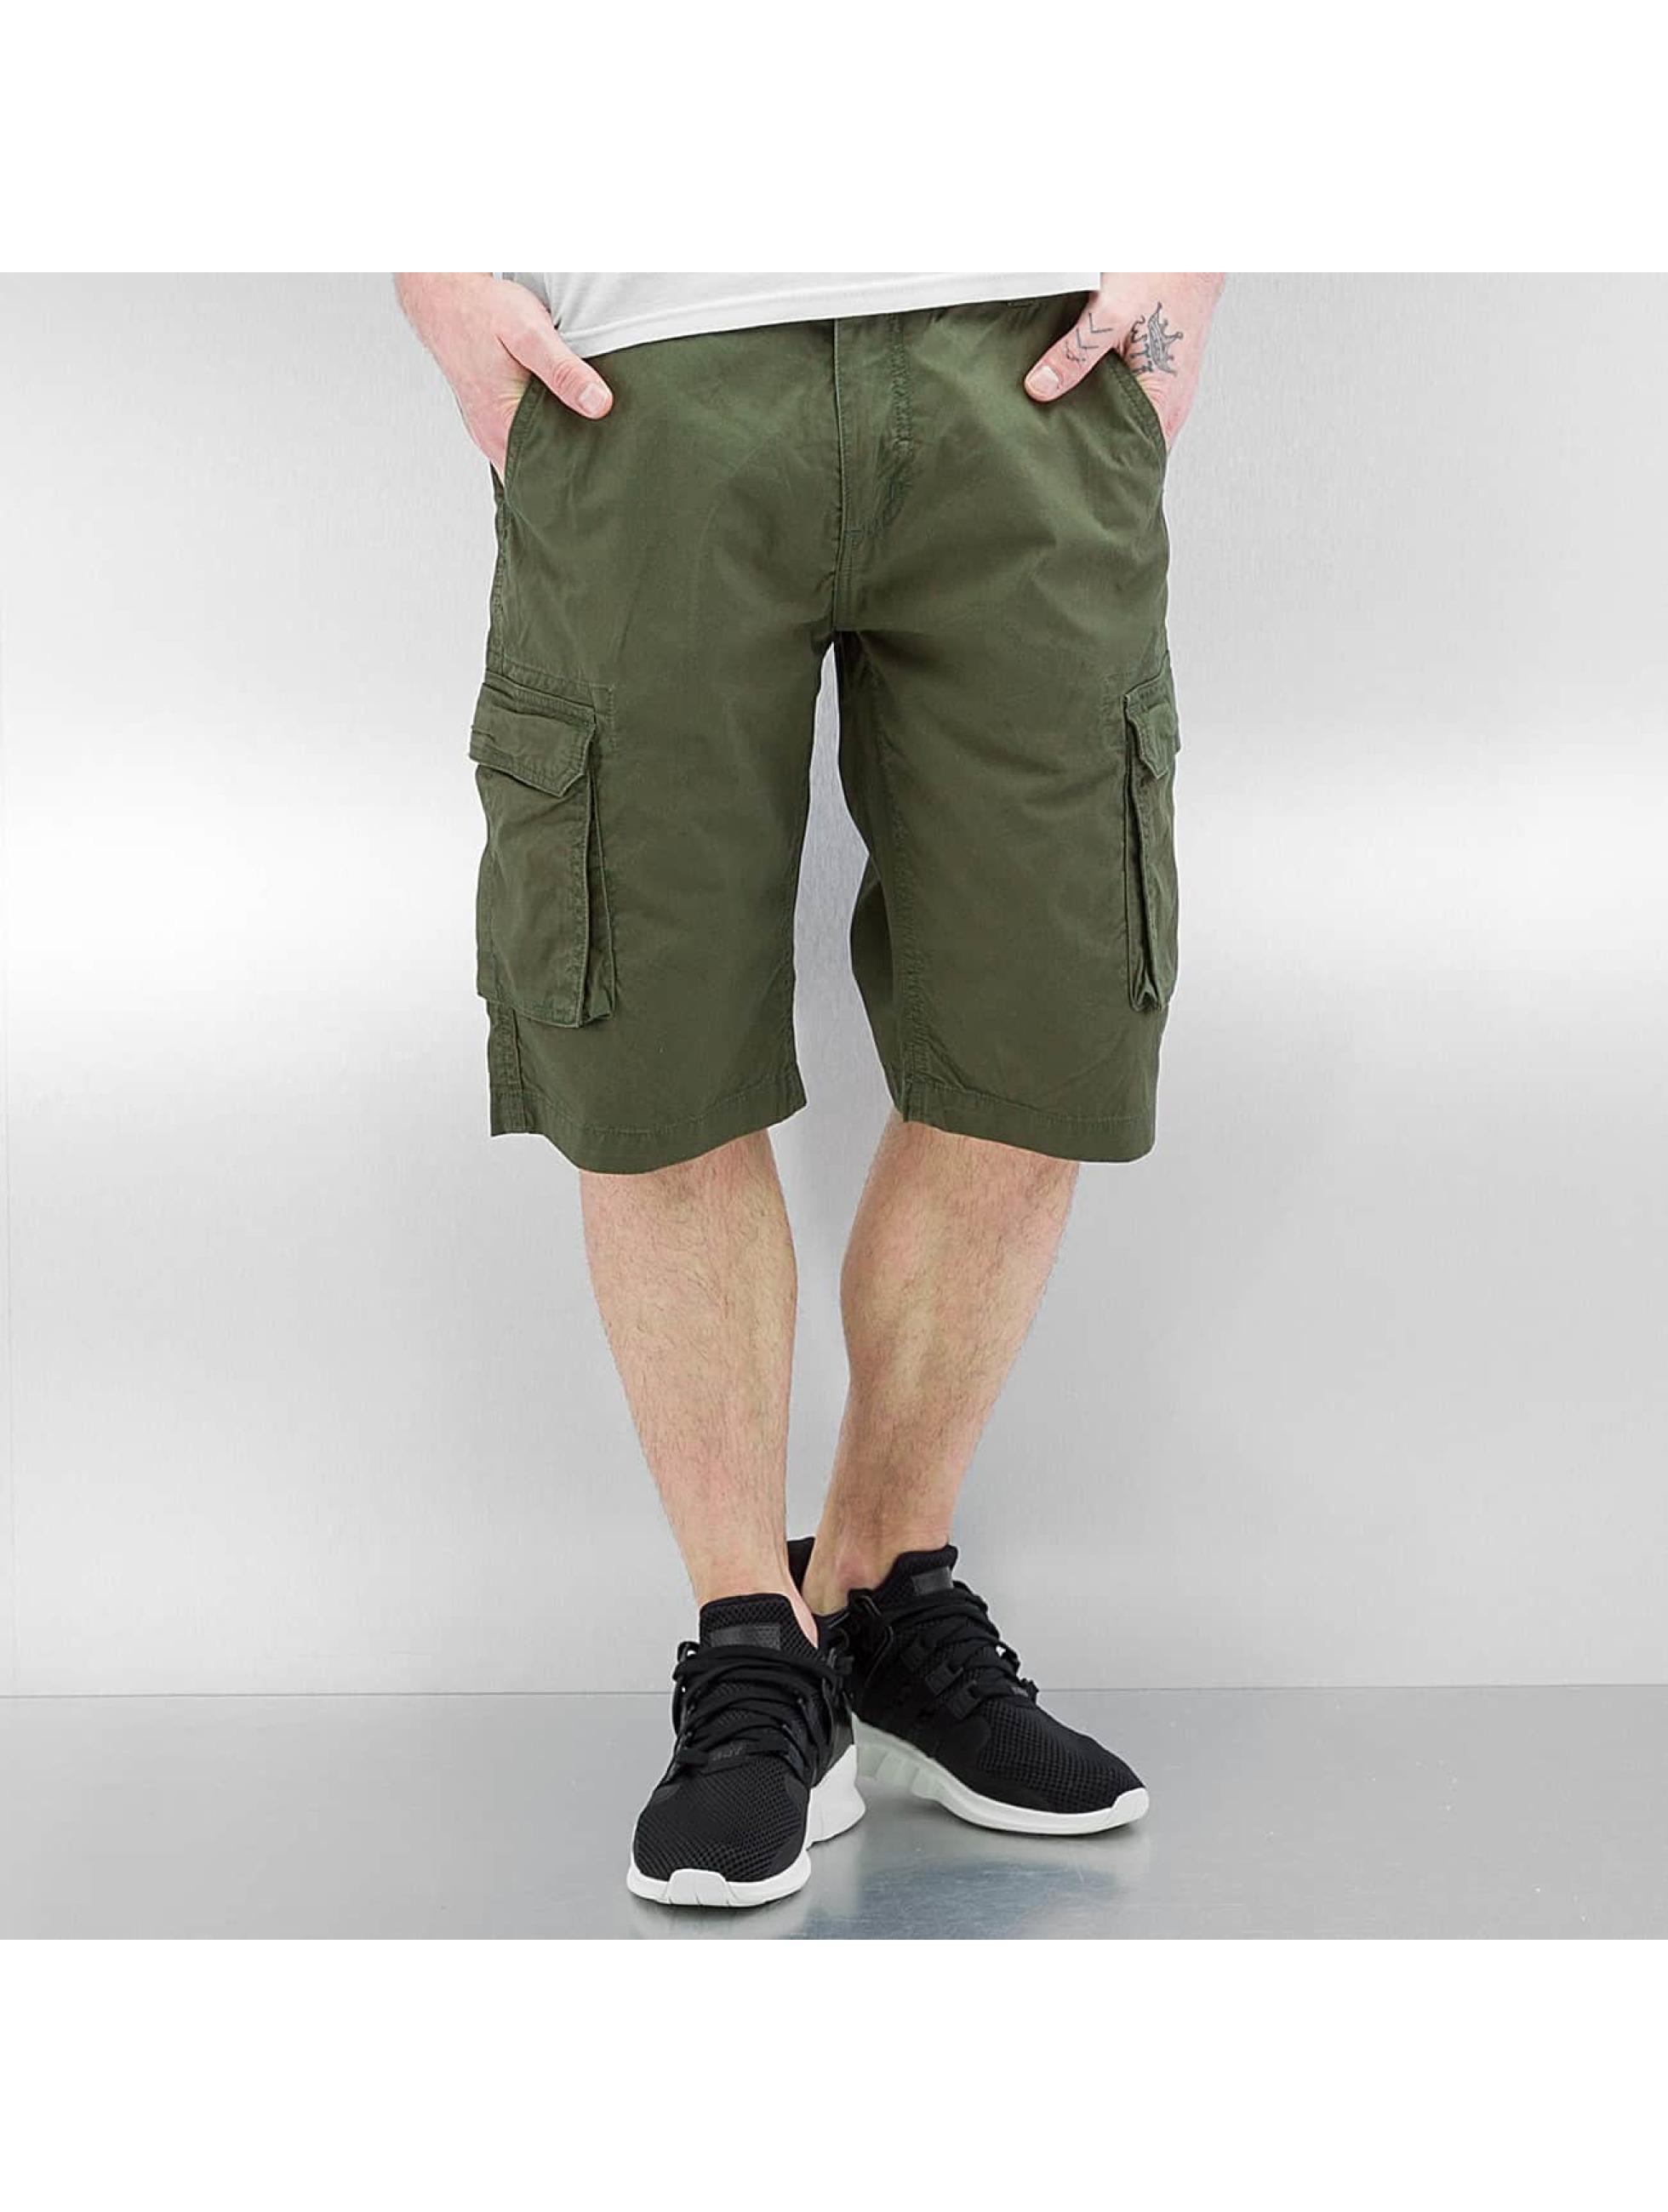 SHINE Original Pantalon / Shorts Xangang en vert